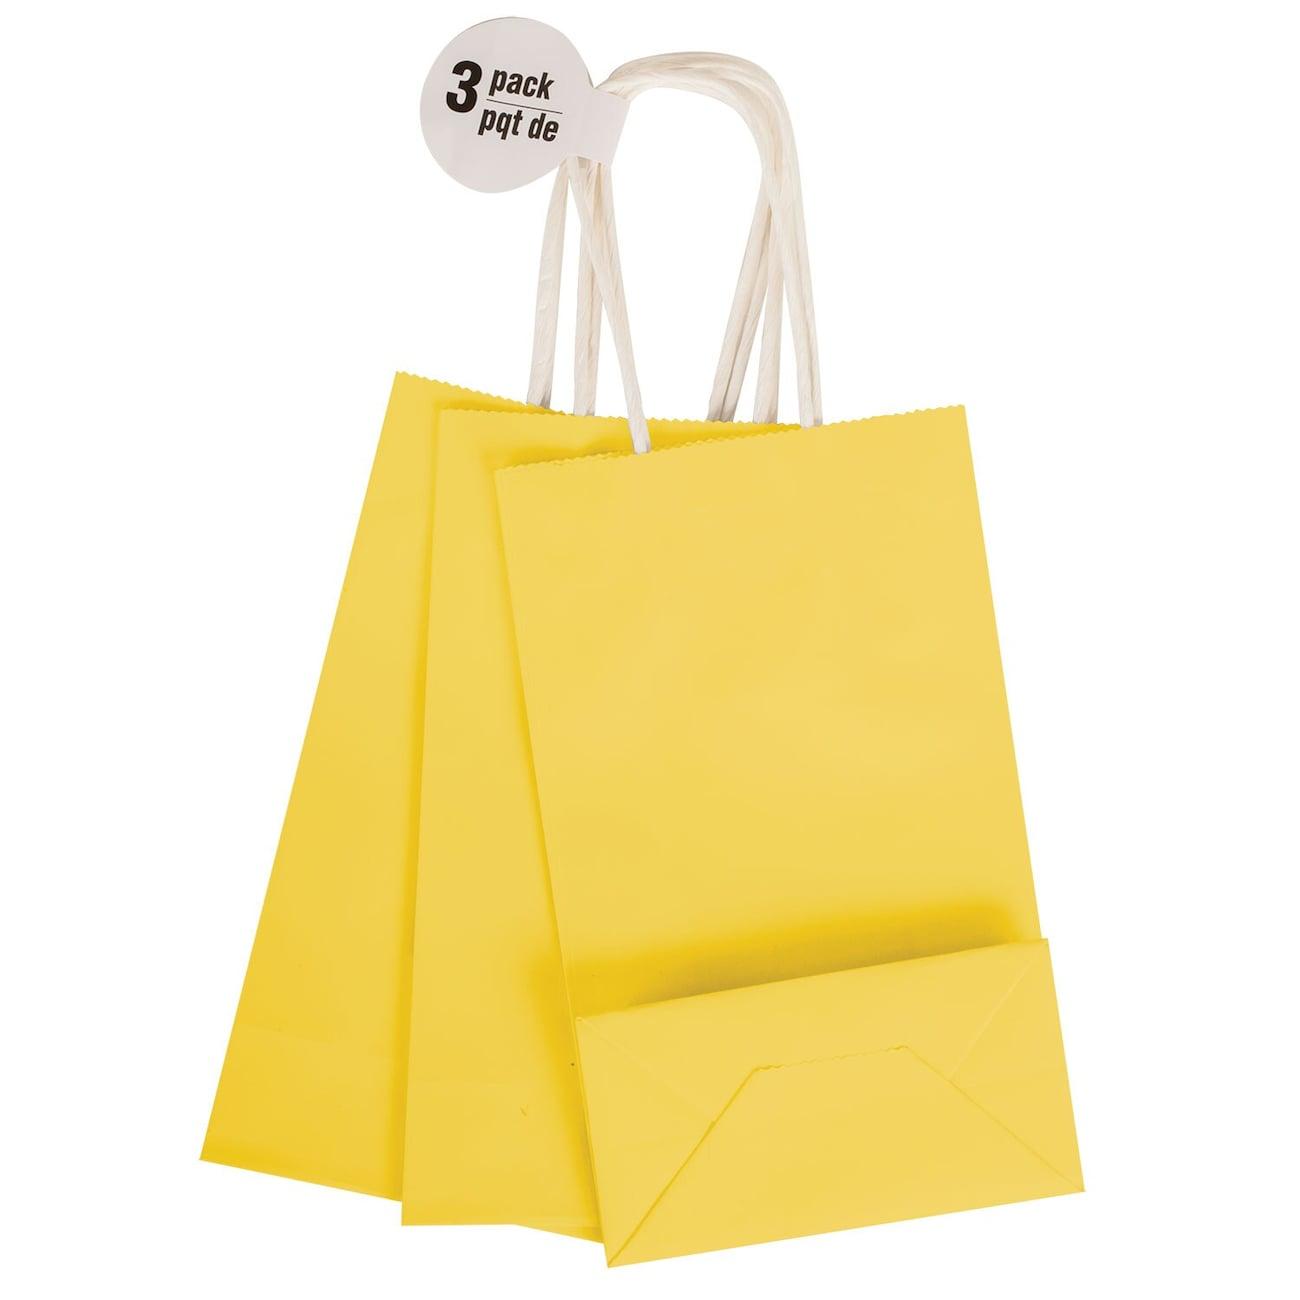 Small Yellow Kraft Paper Gift Bags 3 Ct Packs